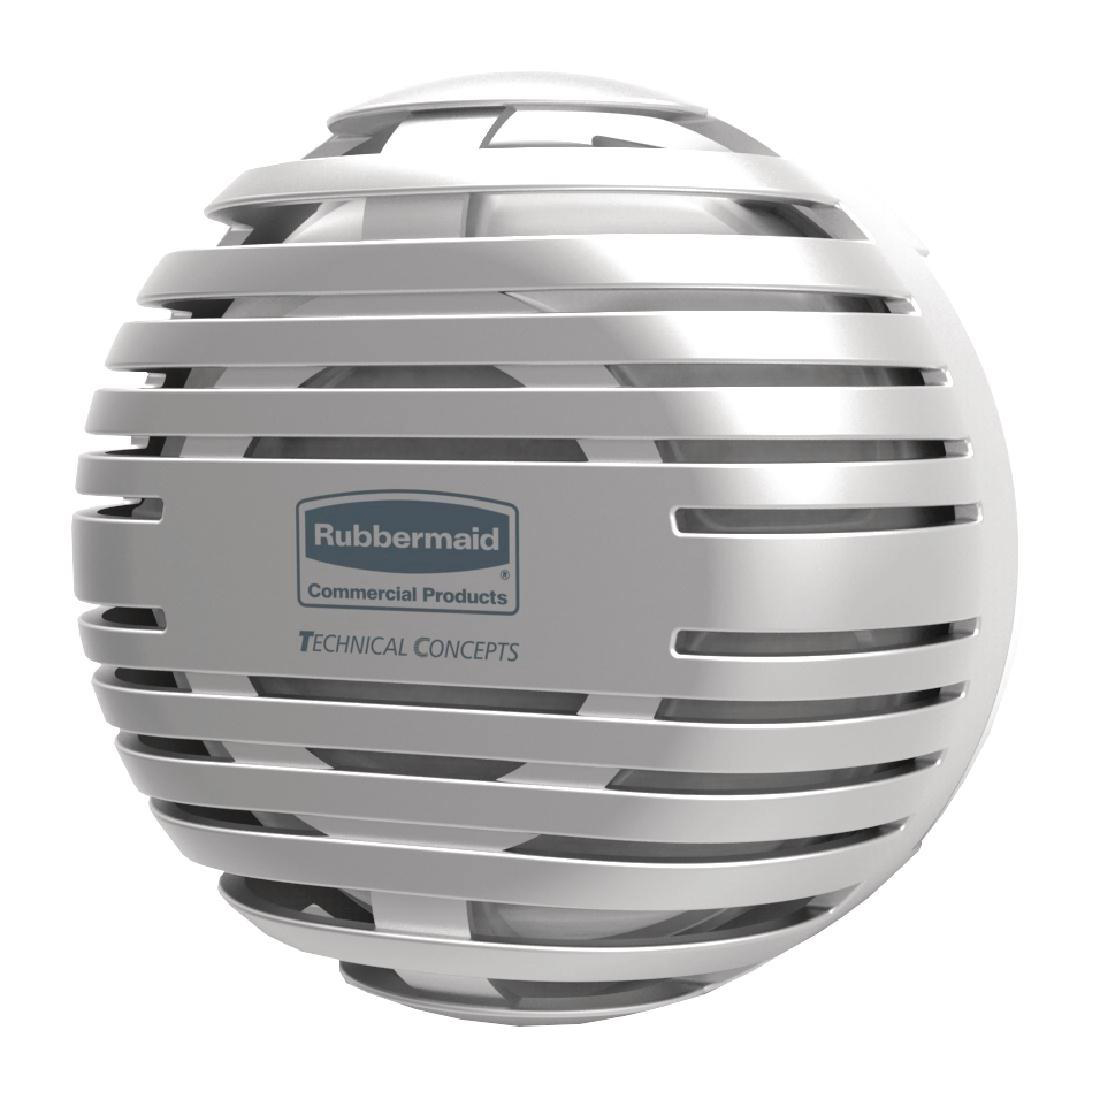 T-Cell 2 Odour Control System Dispenser Non-aerosol Battery-free Chrome Ref 1957533